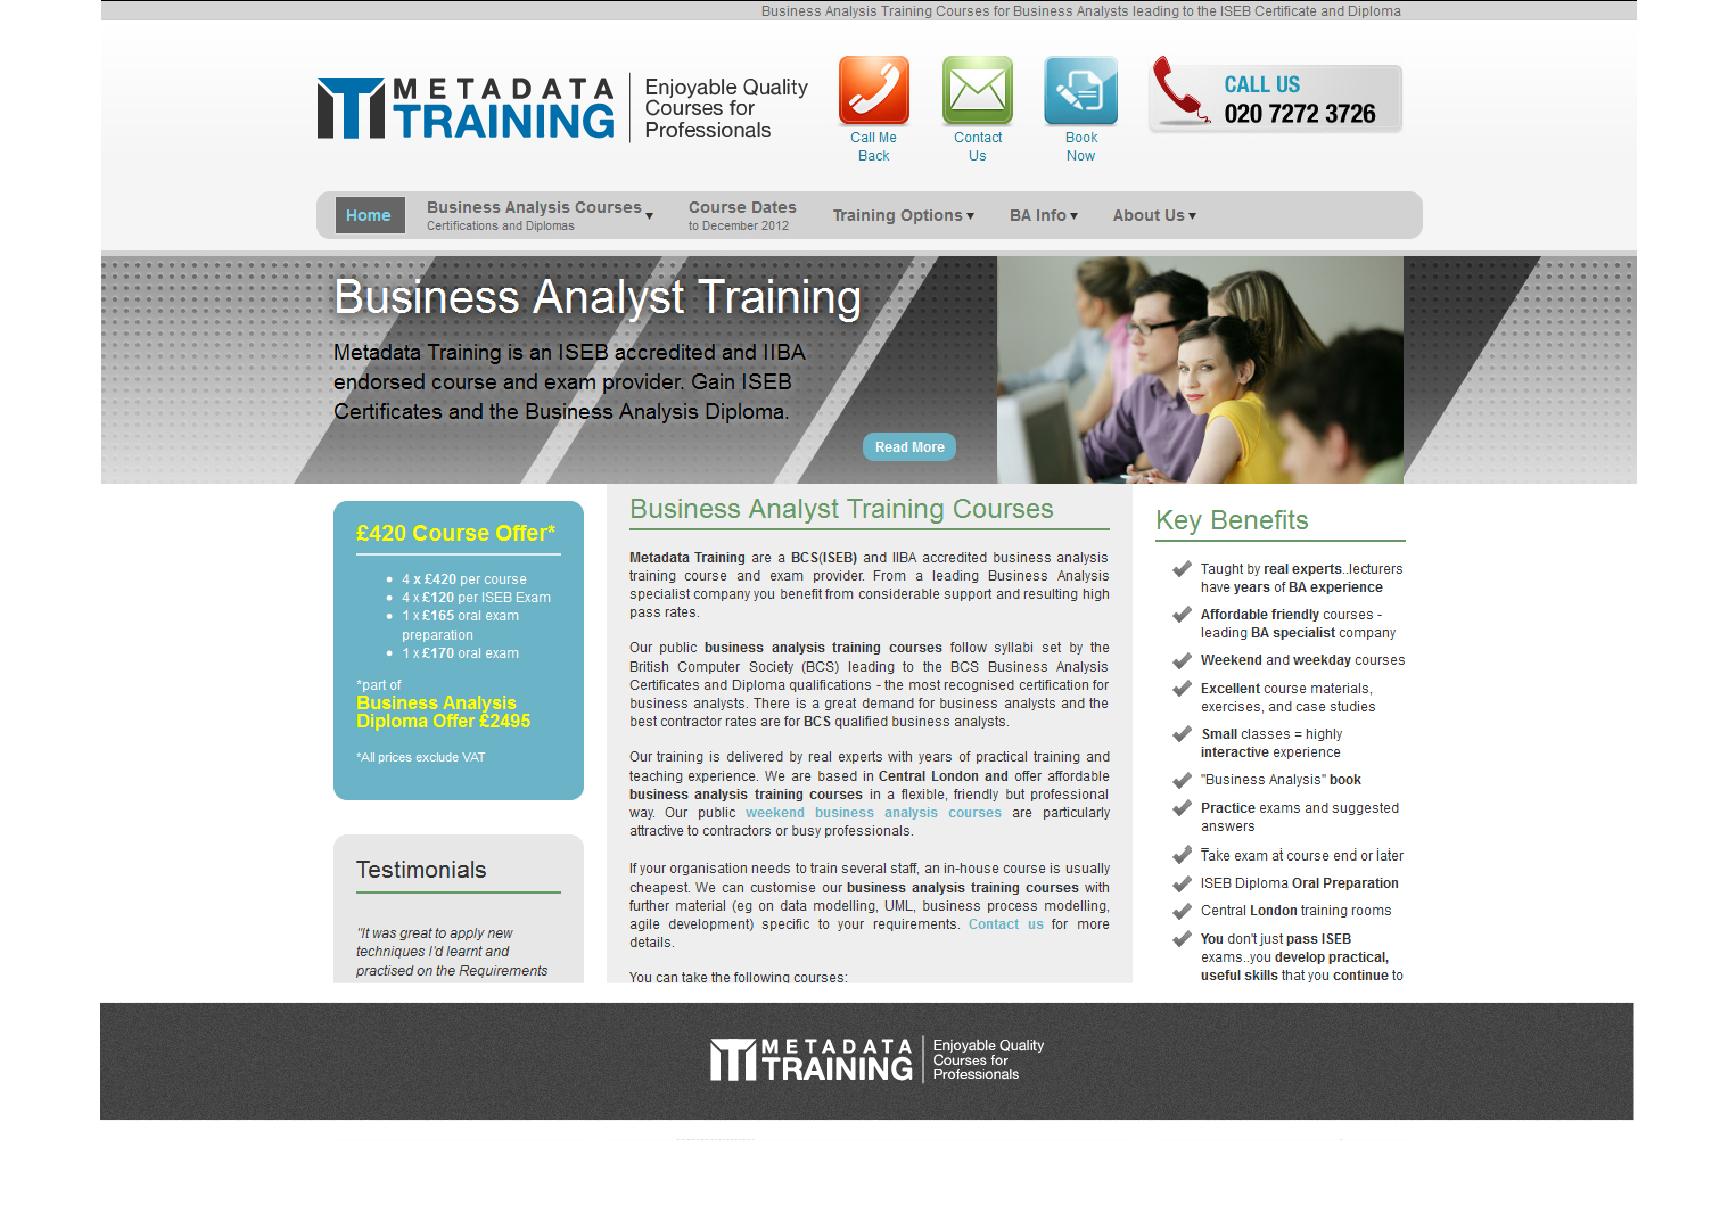 Help Metadata Training with a new logo